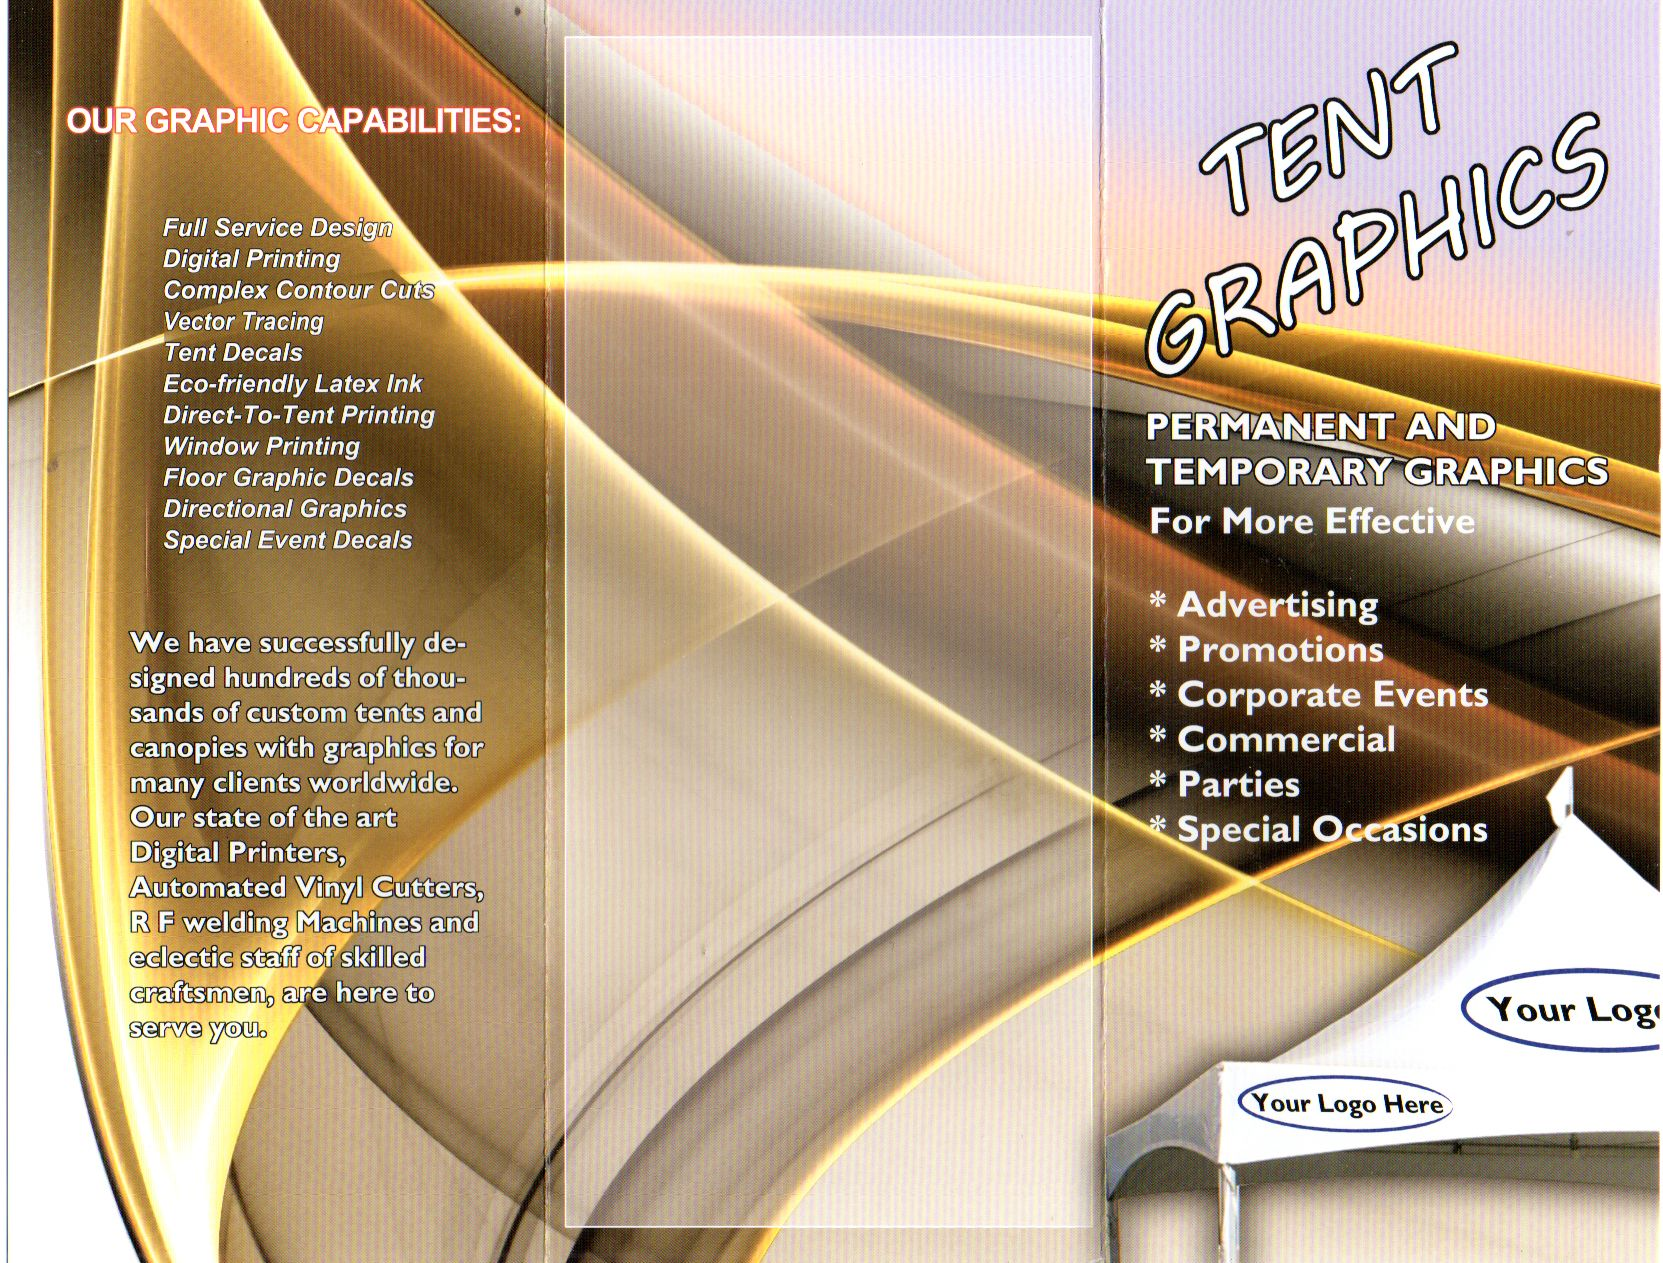 Central Tent brochure 4 & Central Tent brochure 4 | Richard Freeman Portfolio | Pinterest ...